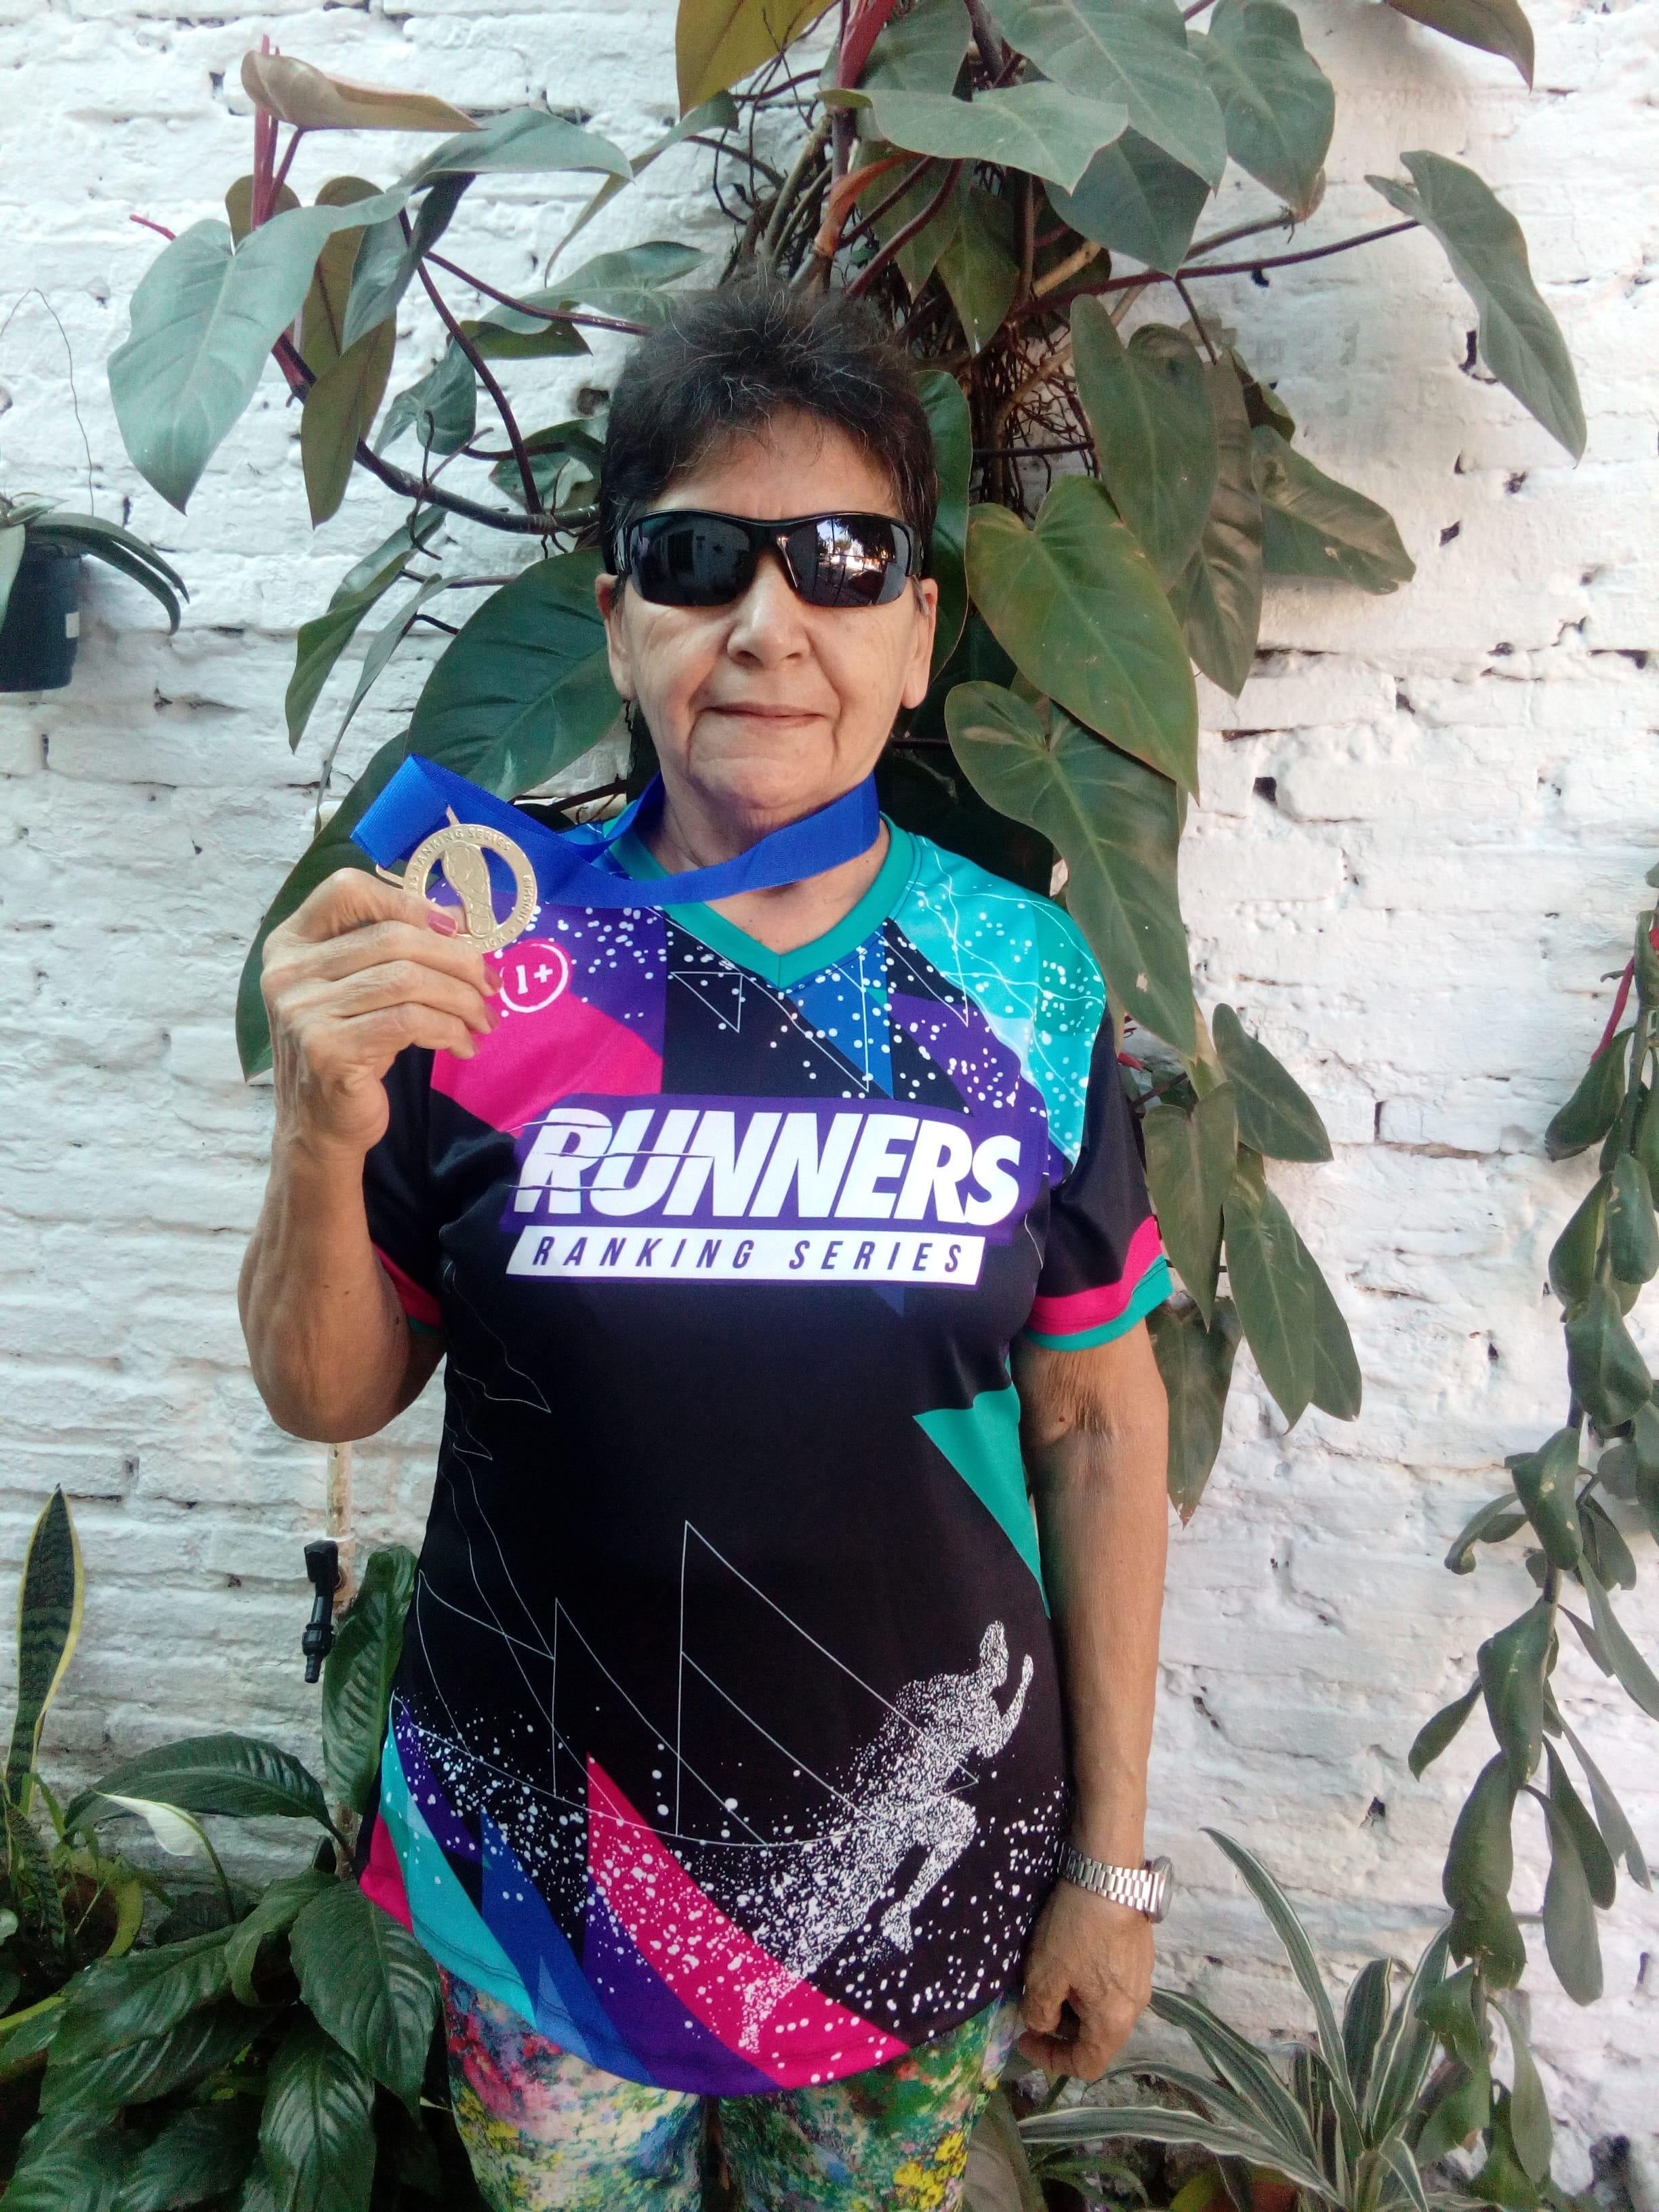 Runners Ranking Series   Primera Fecha